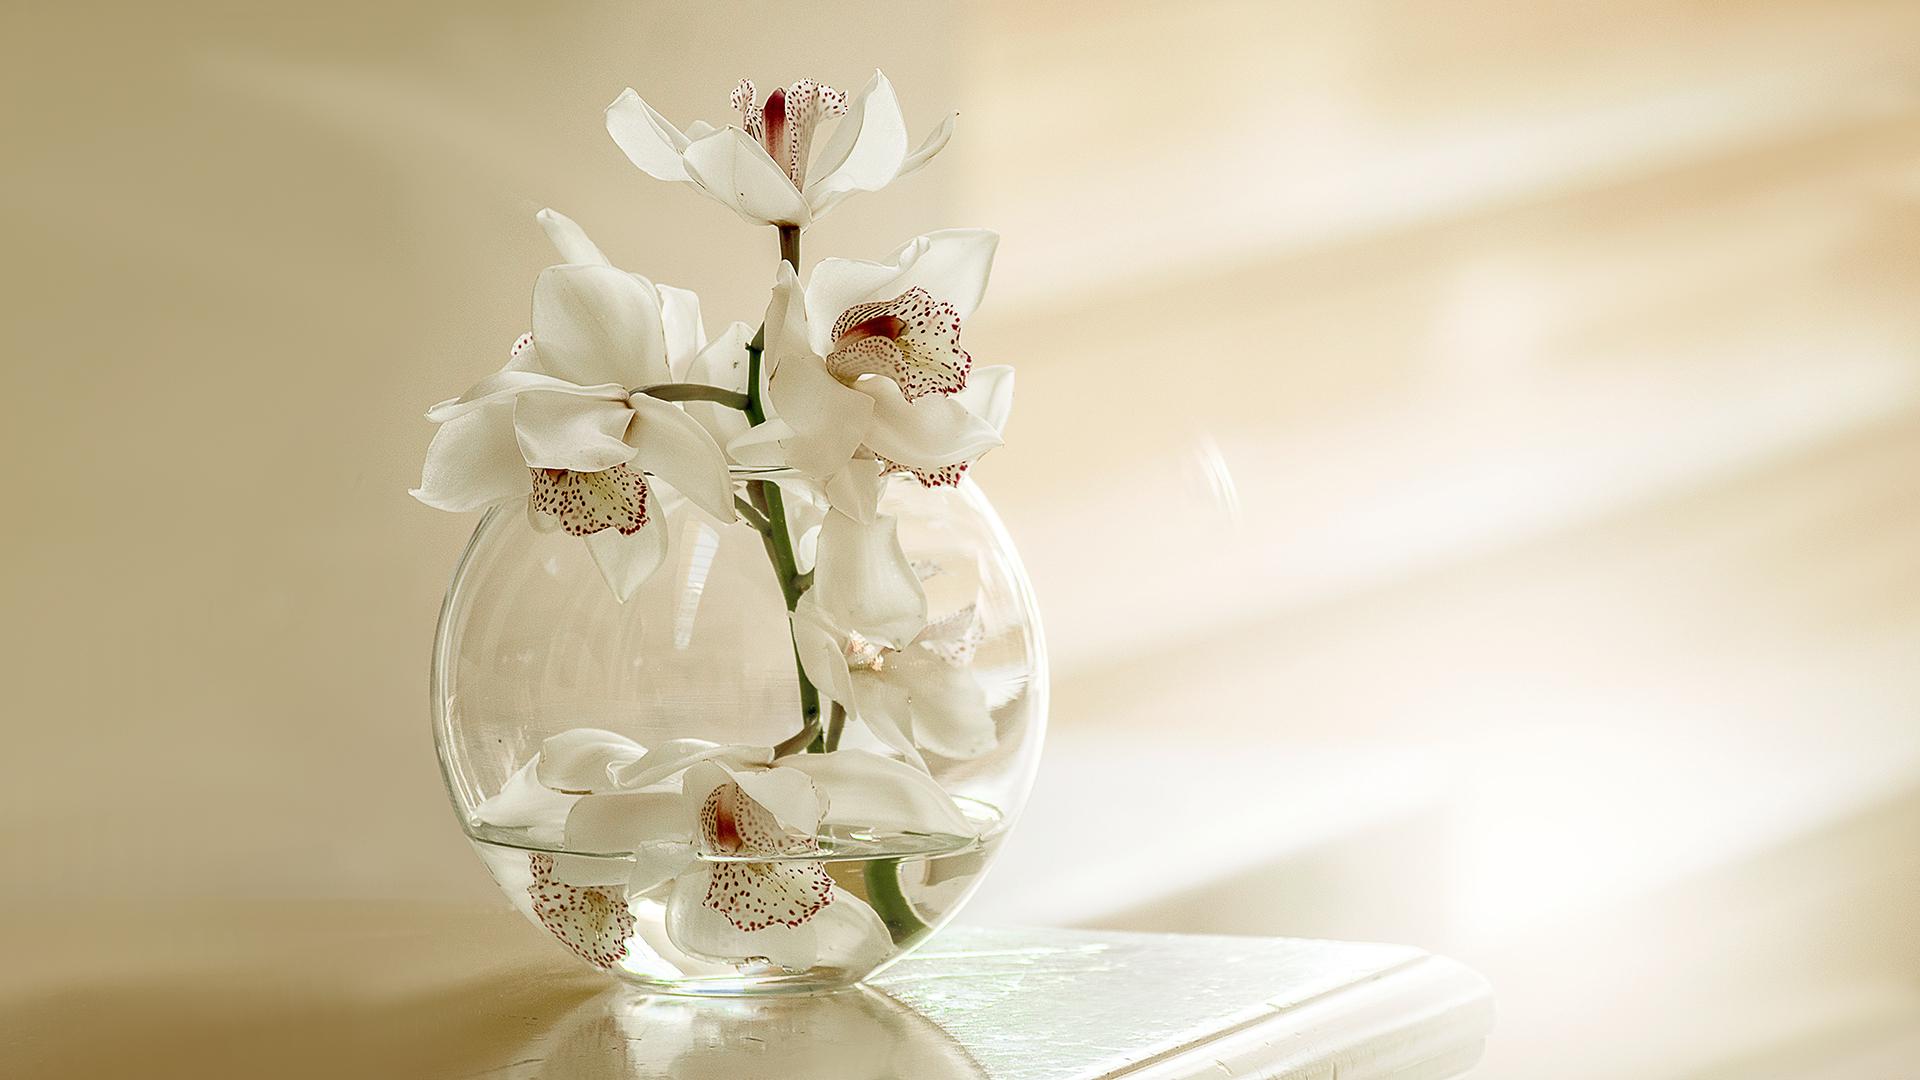 White Orchid Flowers Chromebook Wallpaper